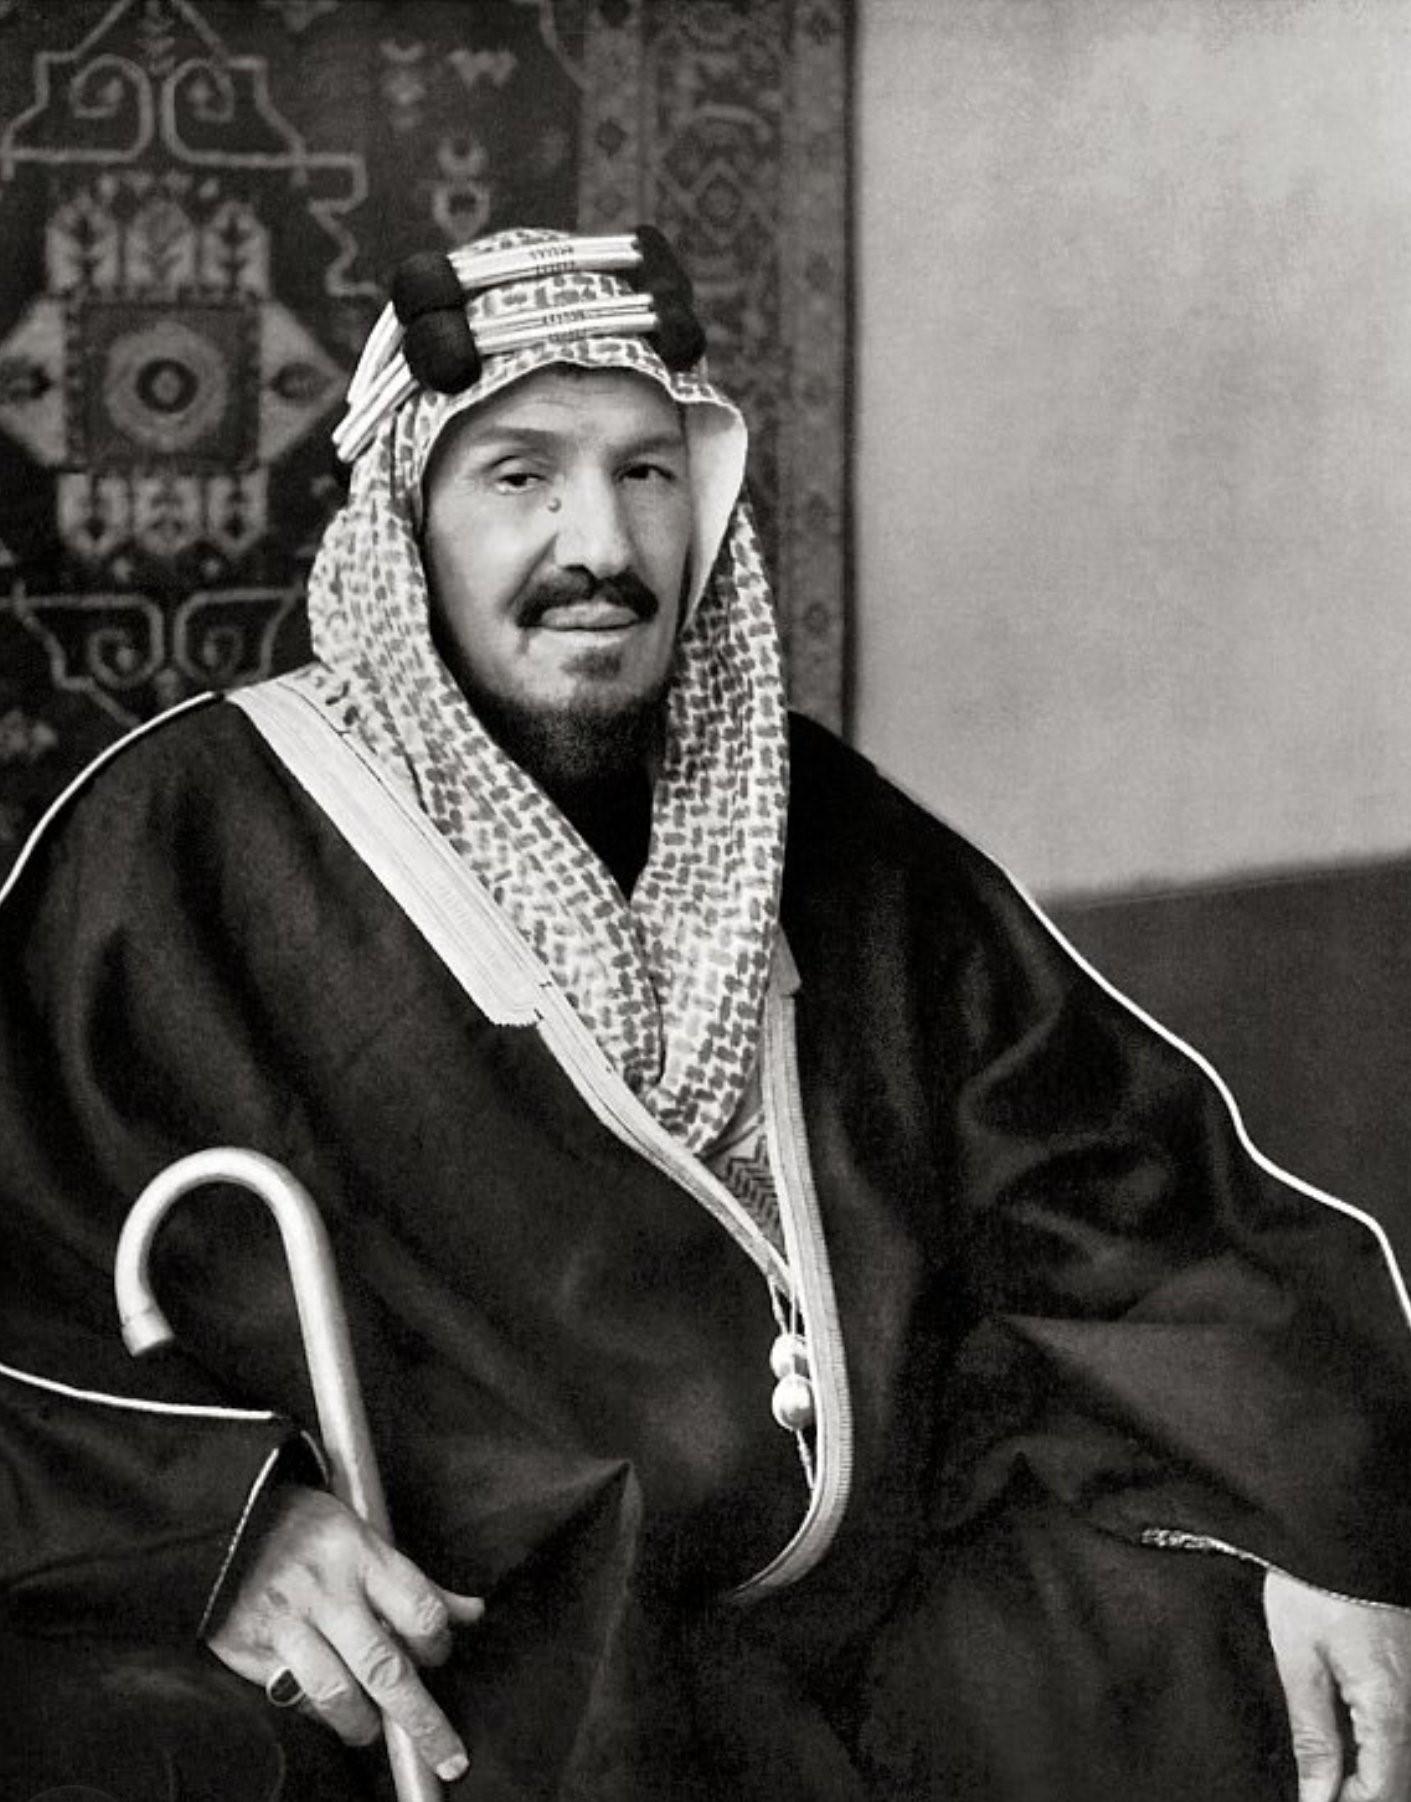 The 96-year old son of father Ibn Saud and mother Fahda bint Asi Al Shuraim Abdul Aziz bin Saud in 2020 photo. Abdul Aziz bin Saud earned a million dollar salary - leaving the net worth at 17 million in 2020